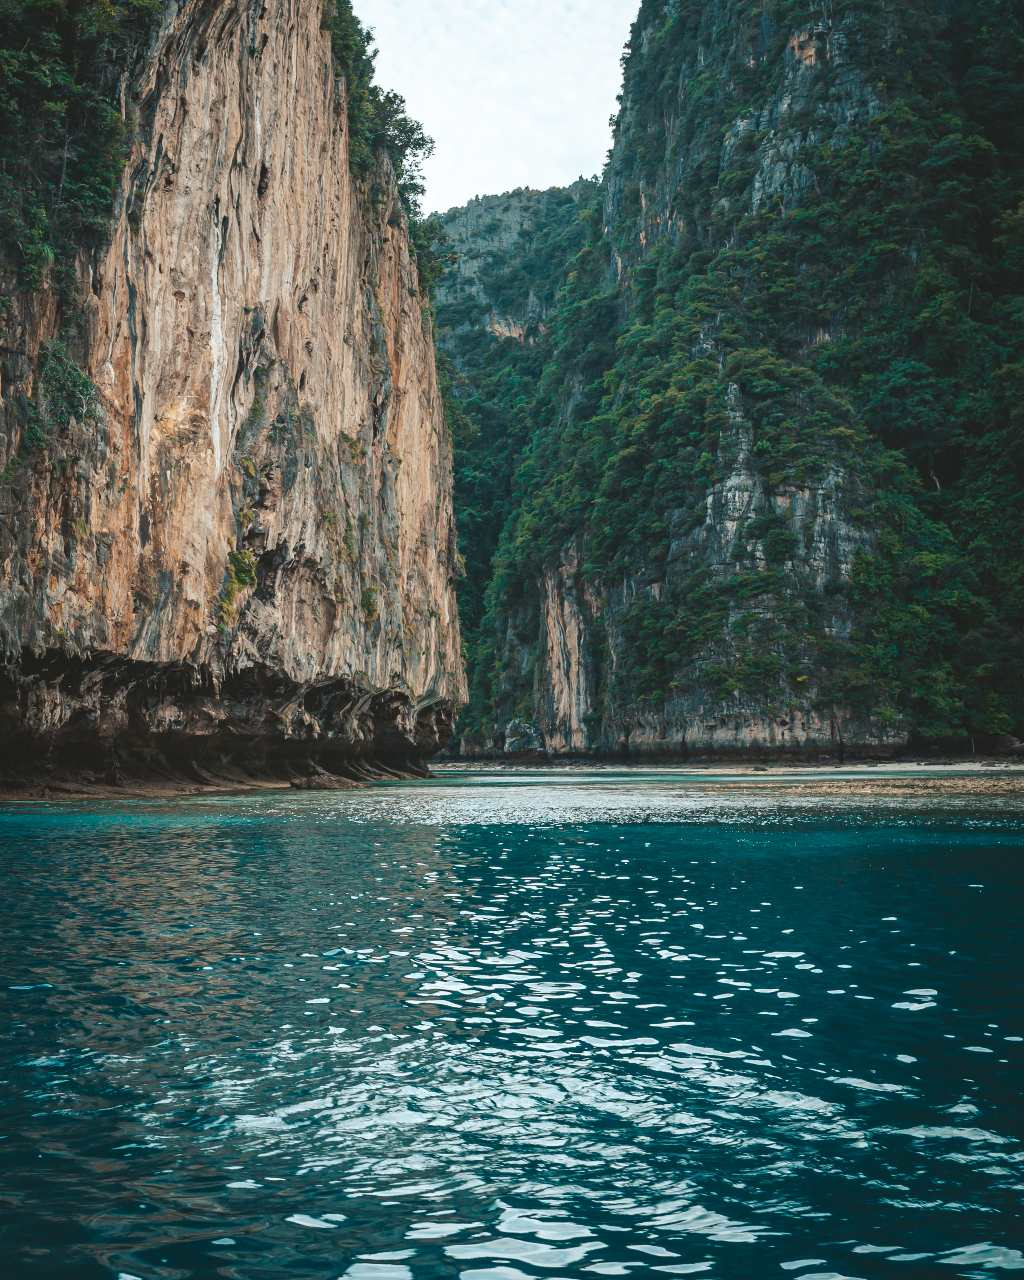 De baai van Phi Ley in Thailand